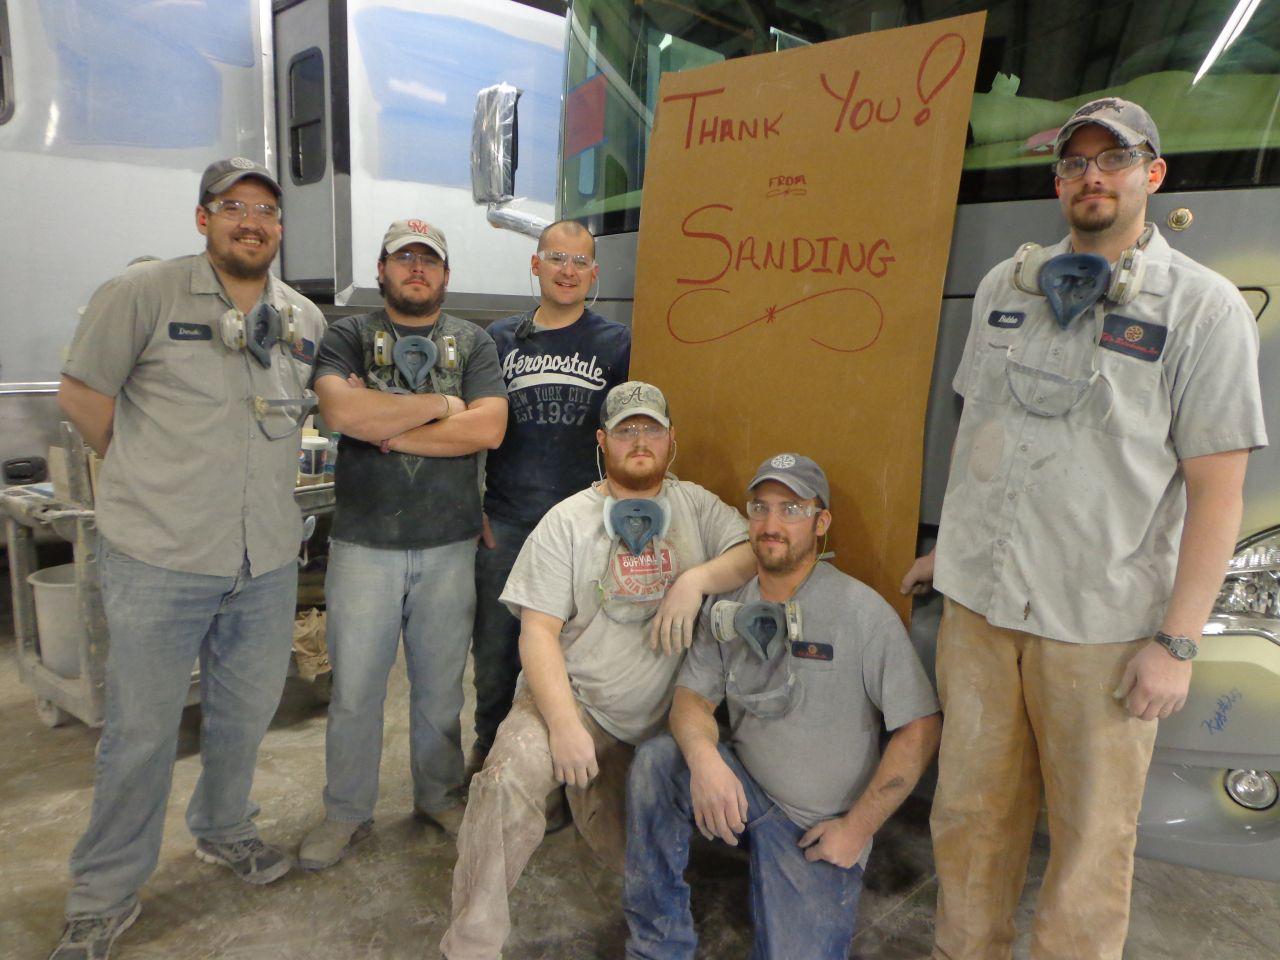 The Sanding Team